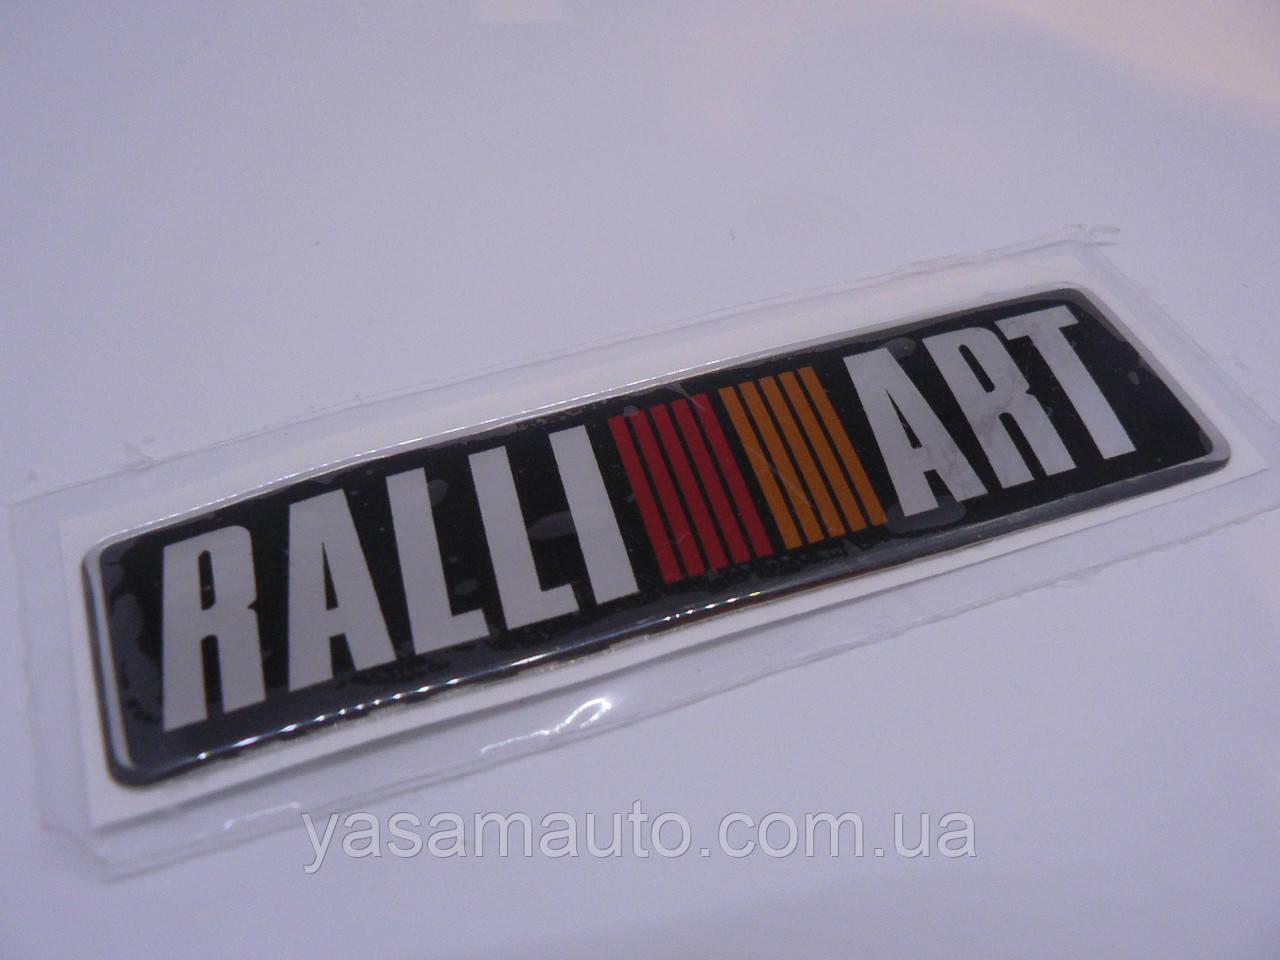 Наклейка s силиконовая надпись RALLI ART силикон 100х28.5х1.3мм Ралли Арт